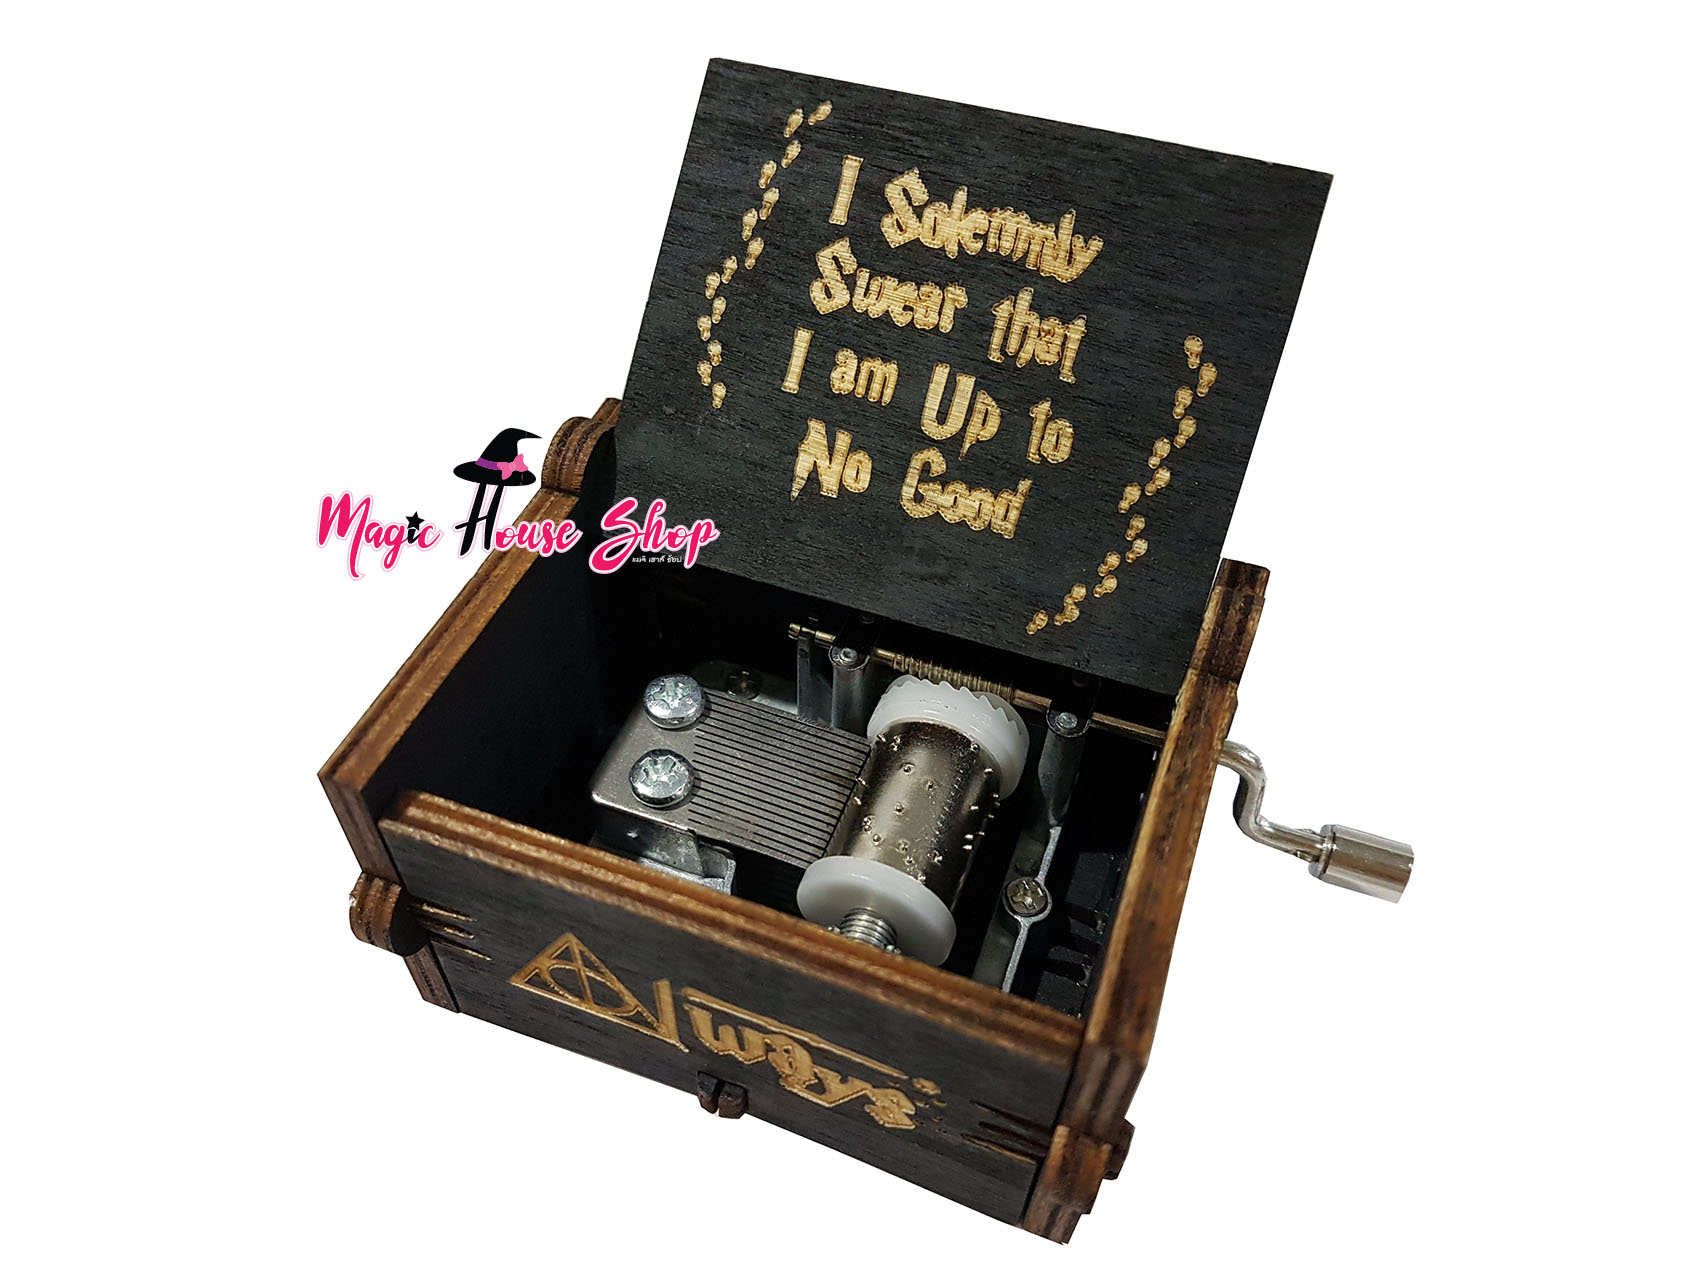 Harry Potter Music Box กล่องดนตรี แฮร์รี่ พอตเตอร์ สีดำ